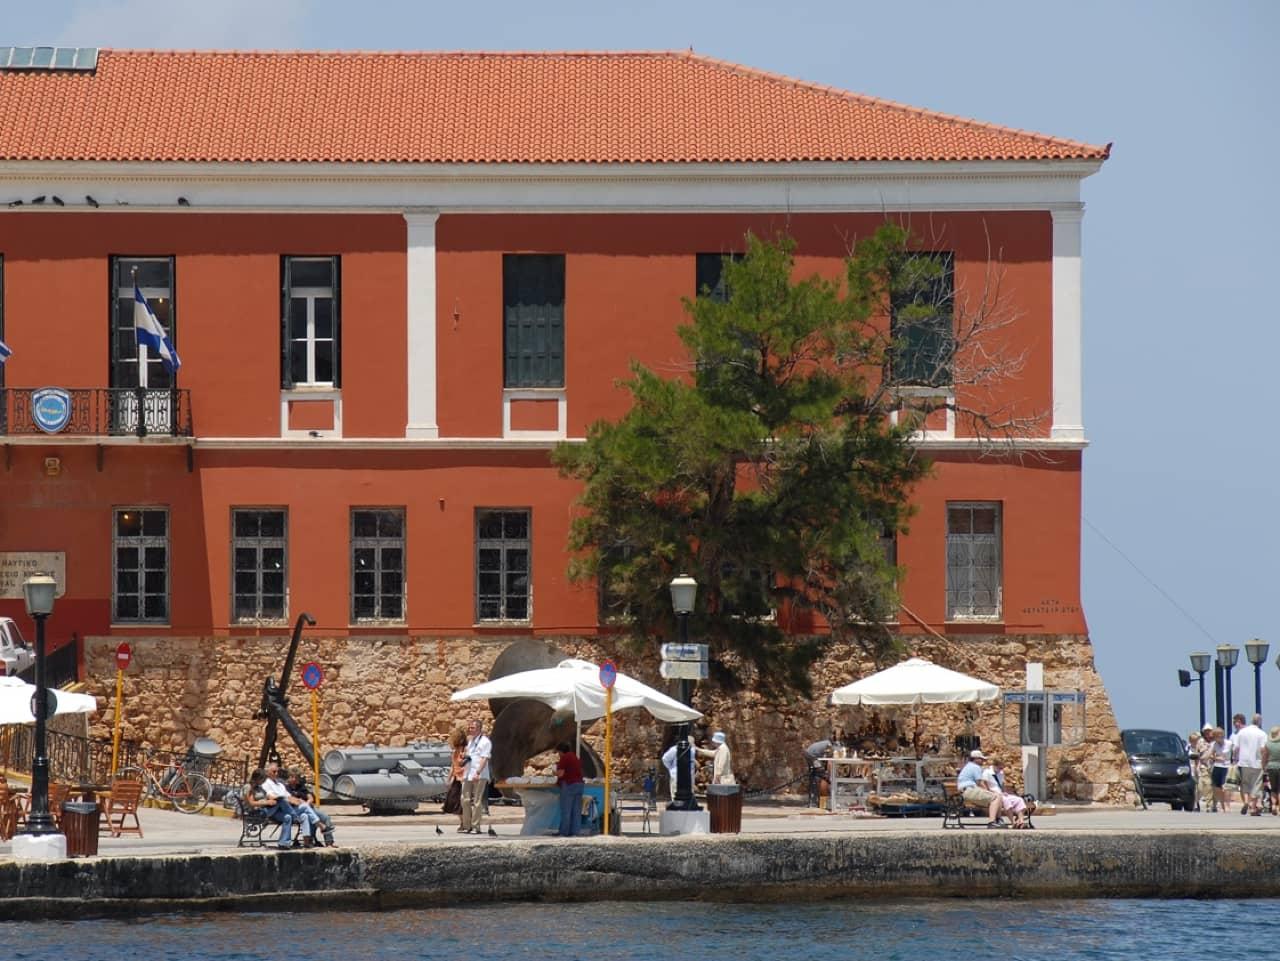 Minoan Lines Mykonos Palace Now Serving Chania-Piraeus